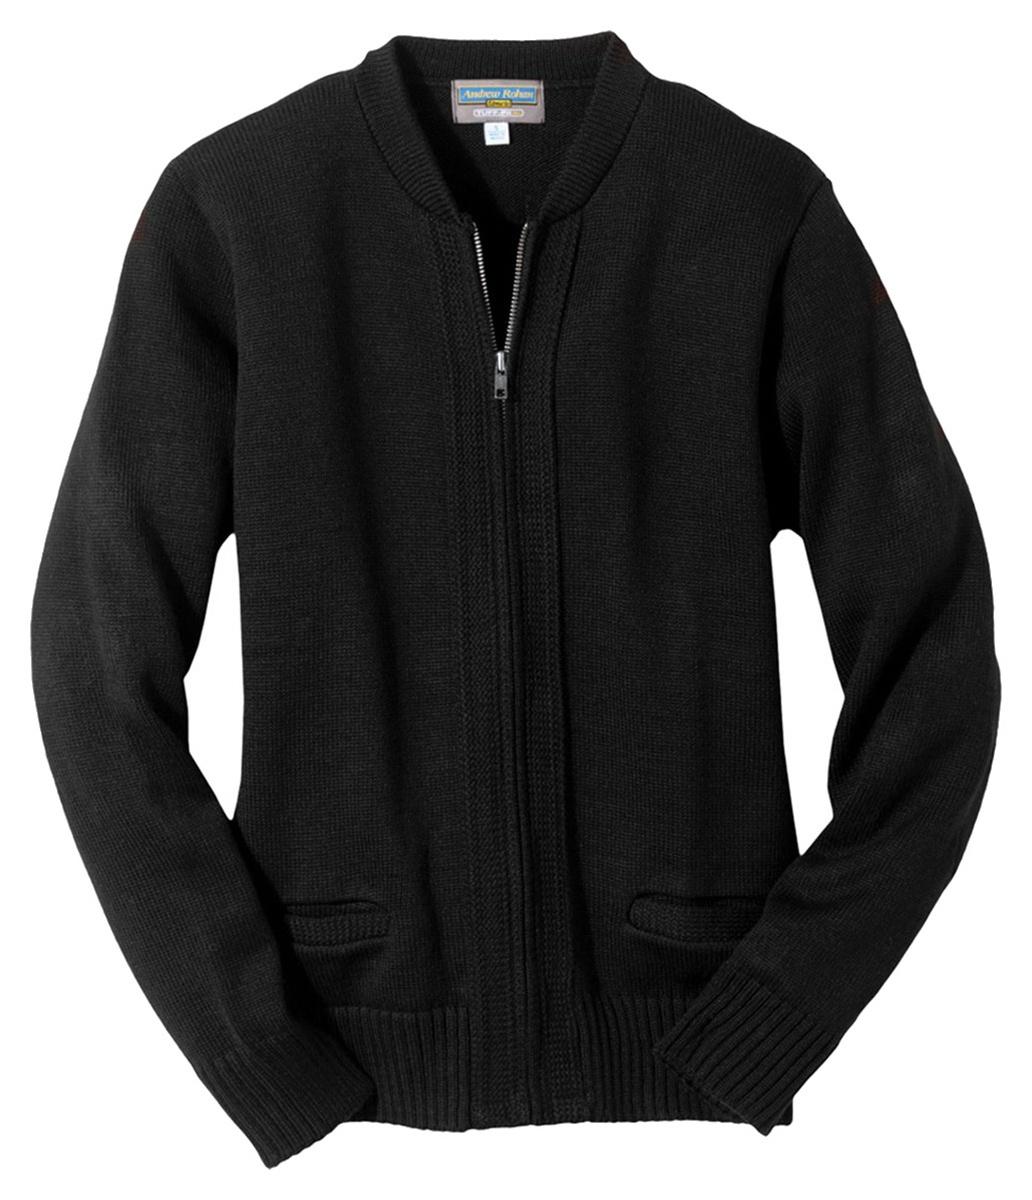 'Edwards 372 Full-Zip Heavyweight Acrylic Sweater'